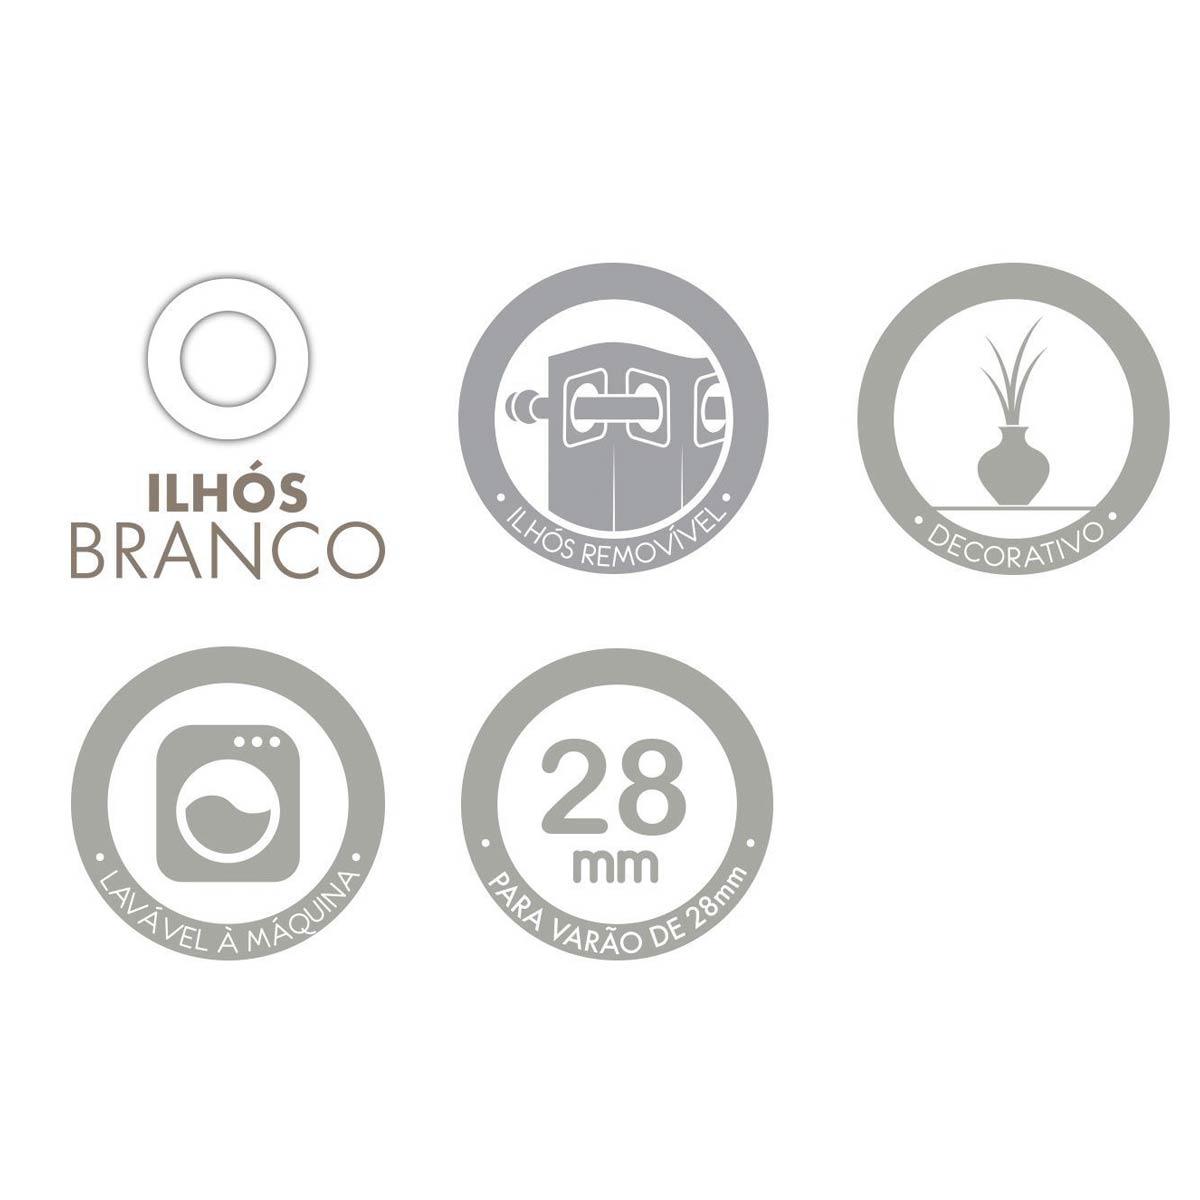 Cortina De Janela Com Forro Tecido 2,00 x 1,80 Barcelona Cinza Santista